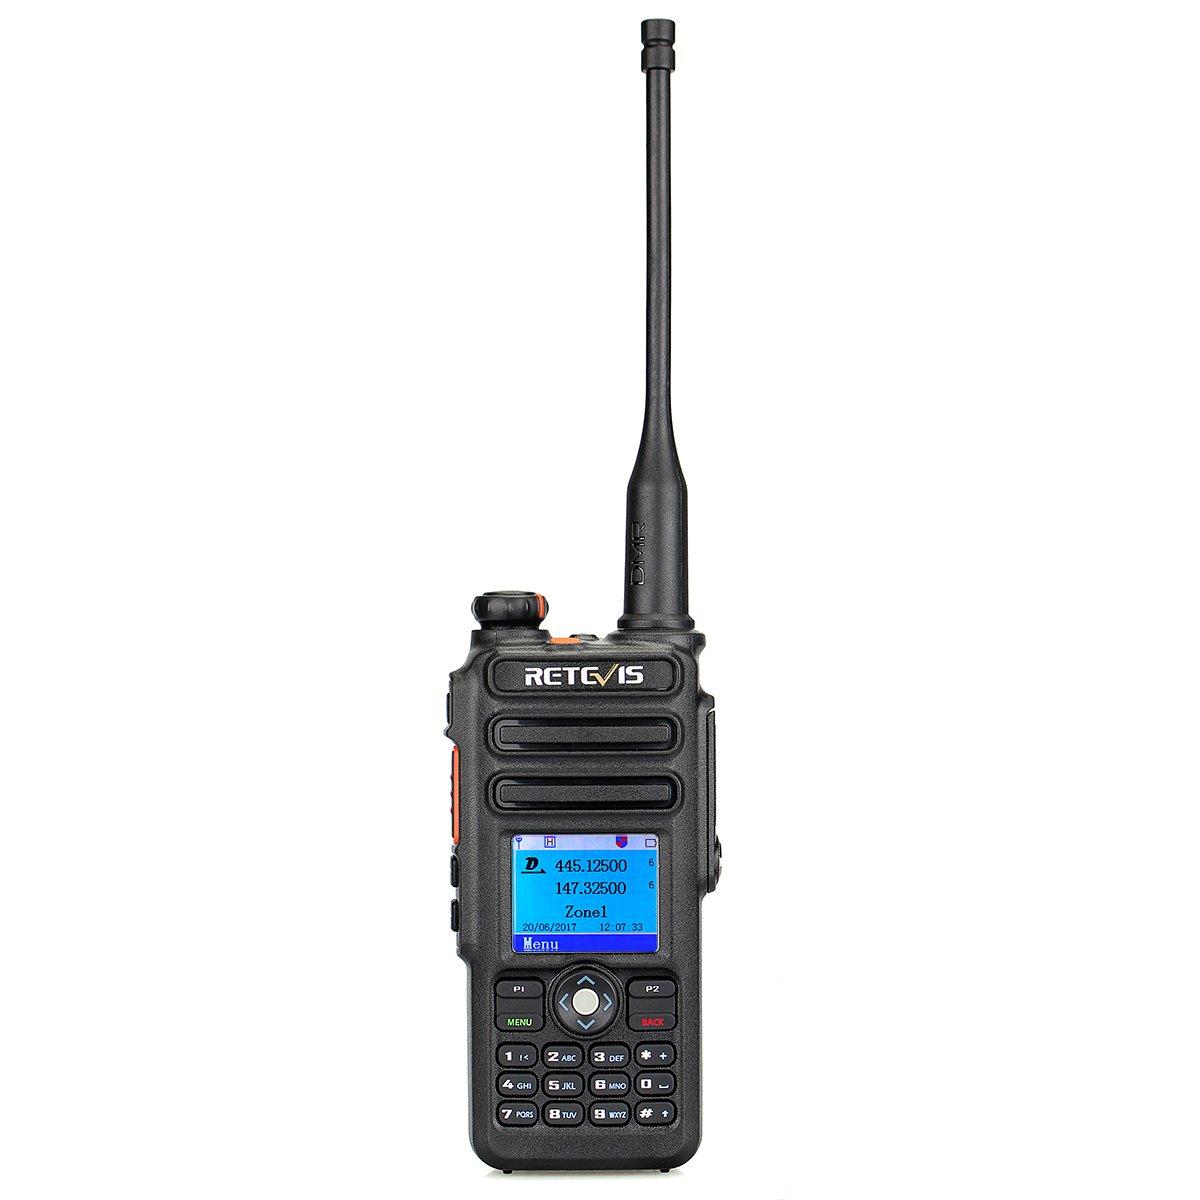 Retevis RT82 Dual Band DMR Digital 2 Way Radio Waterproof 3000 Channels 10000 Contacts List GPS Ham Amateur Radio with Record Function FA9127B-J9127P